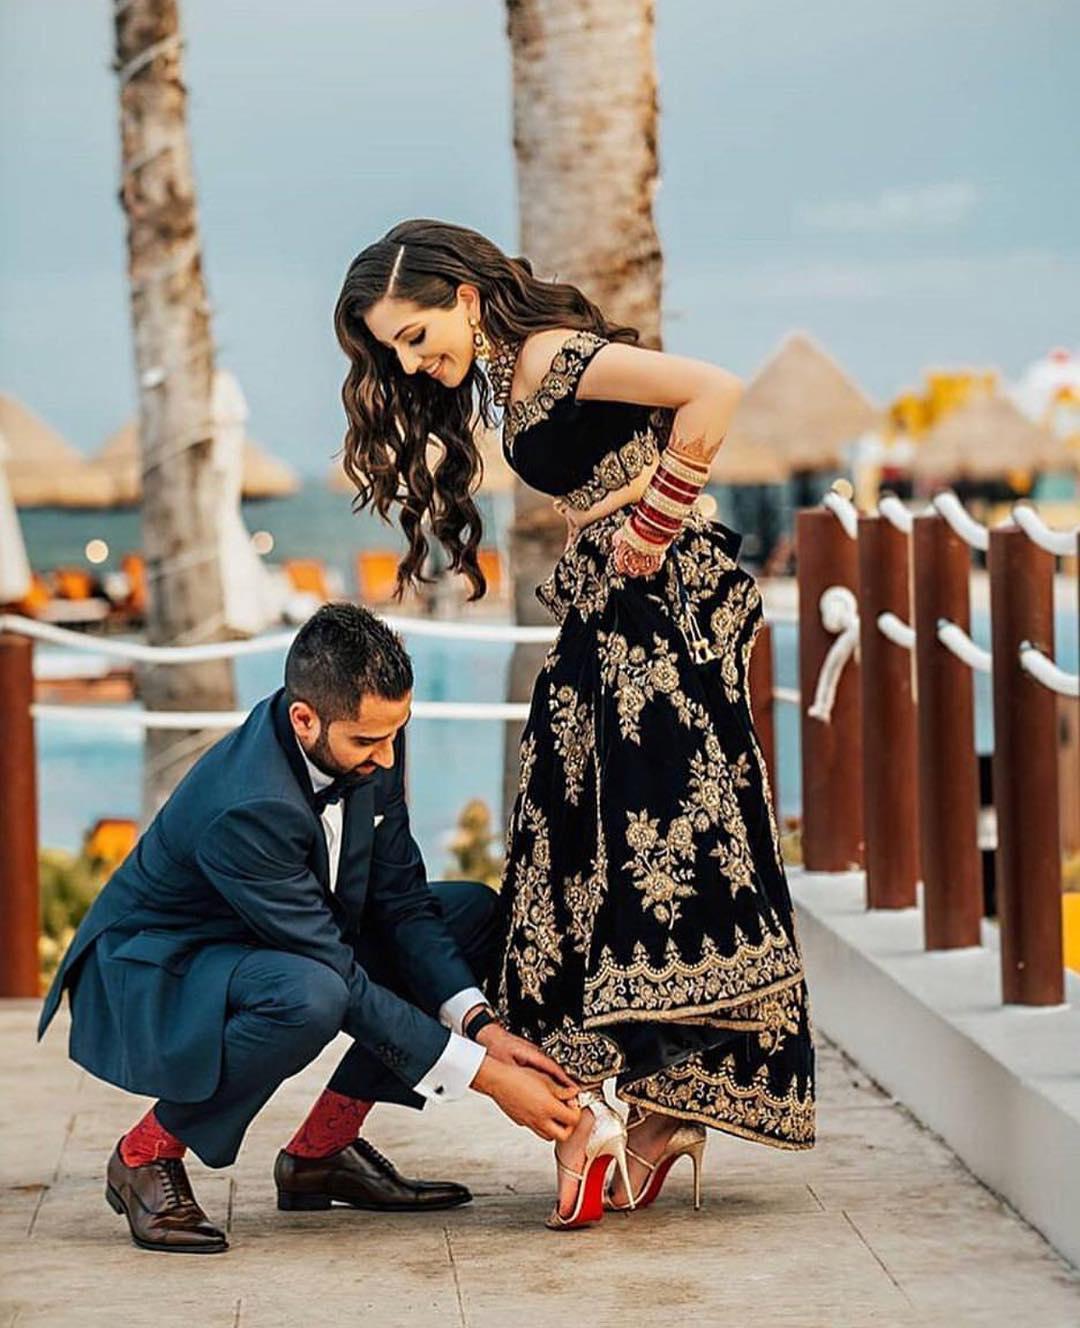 Romantic Couple FB DP | Facebook Display Pictures